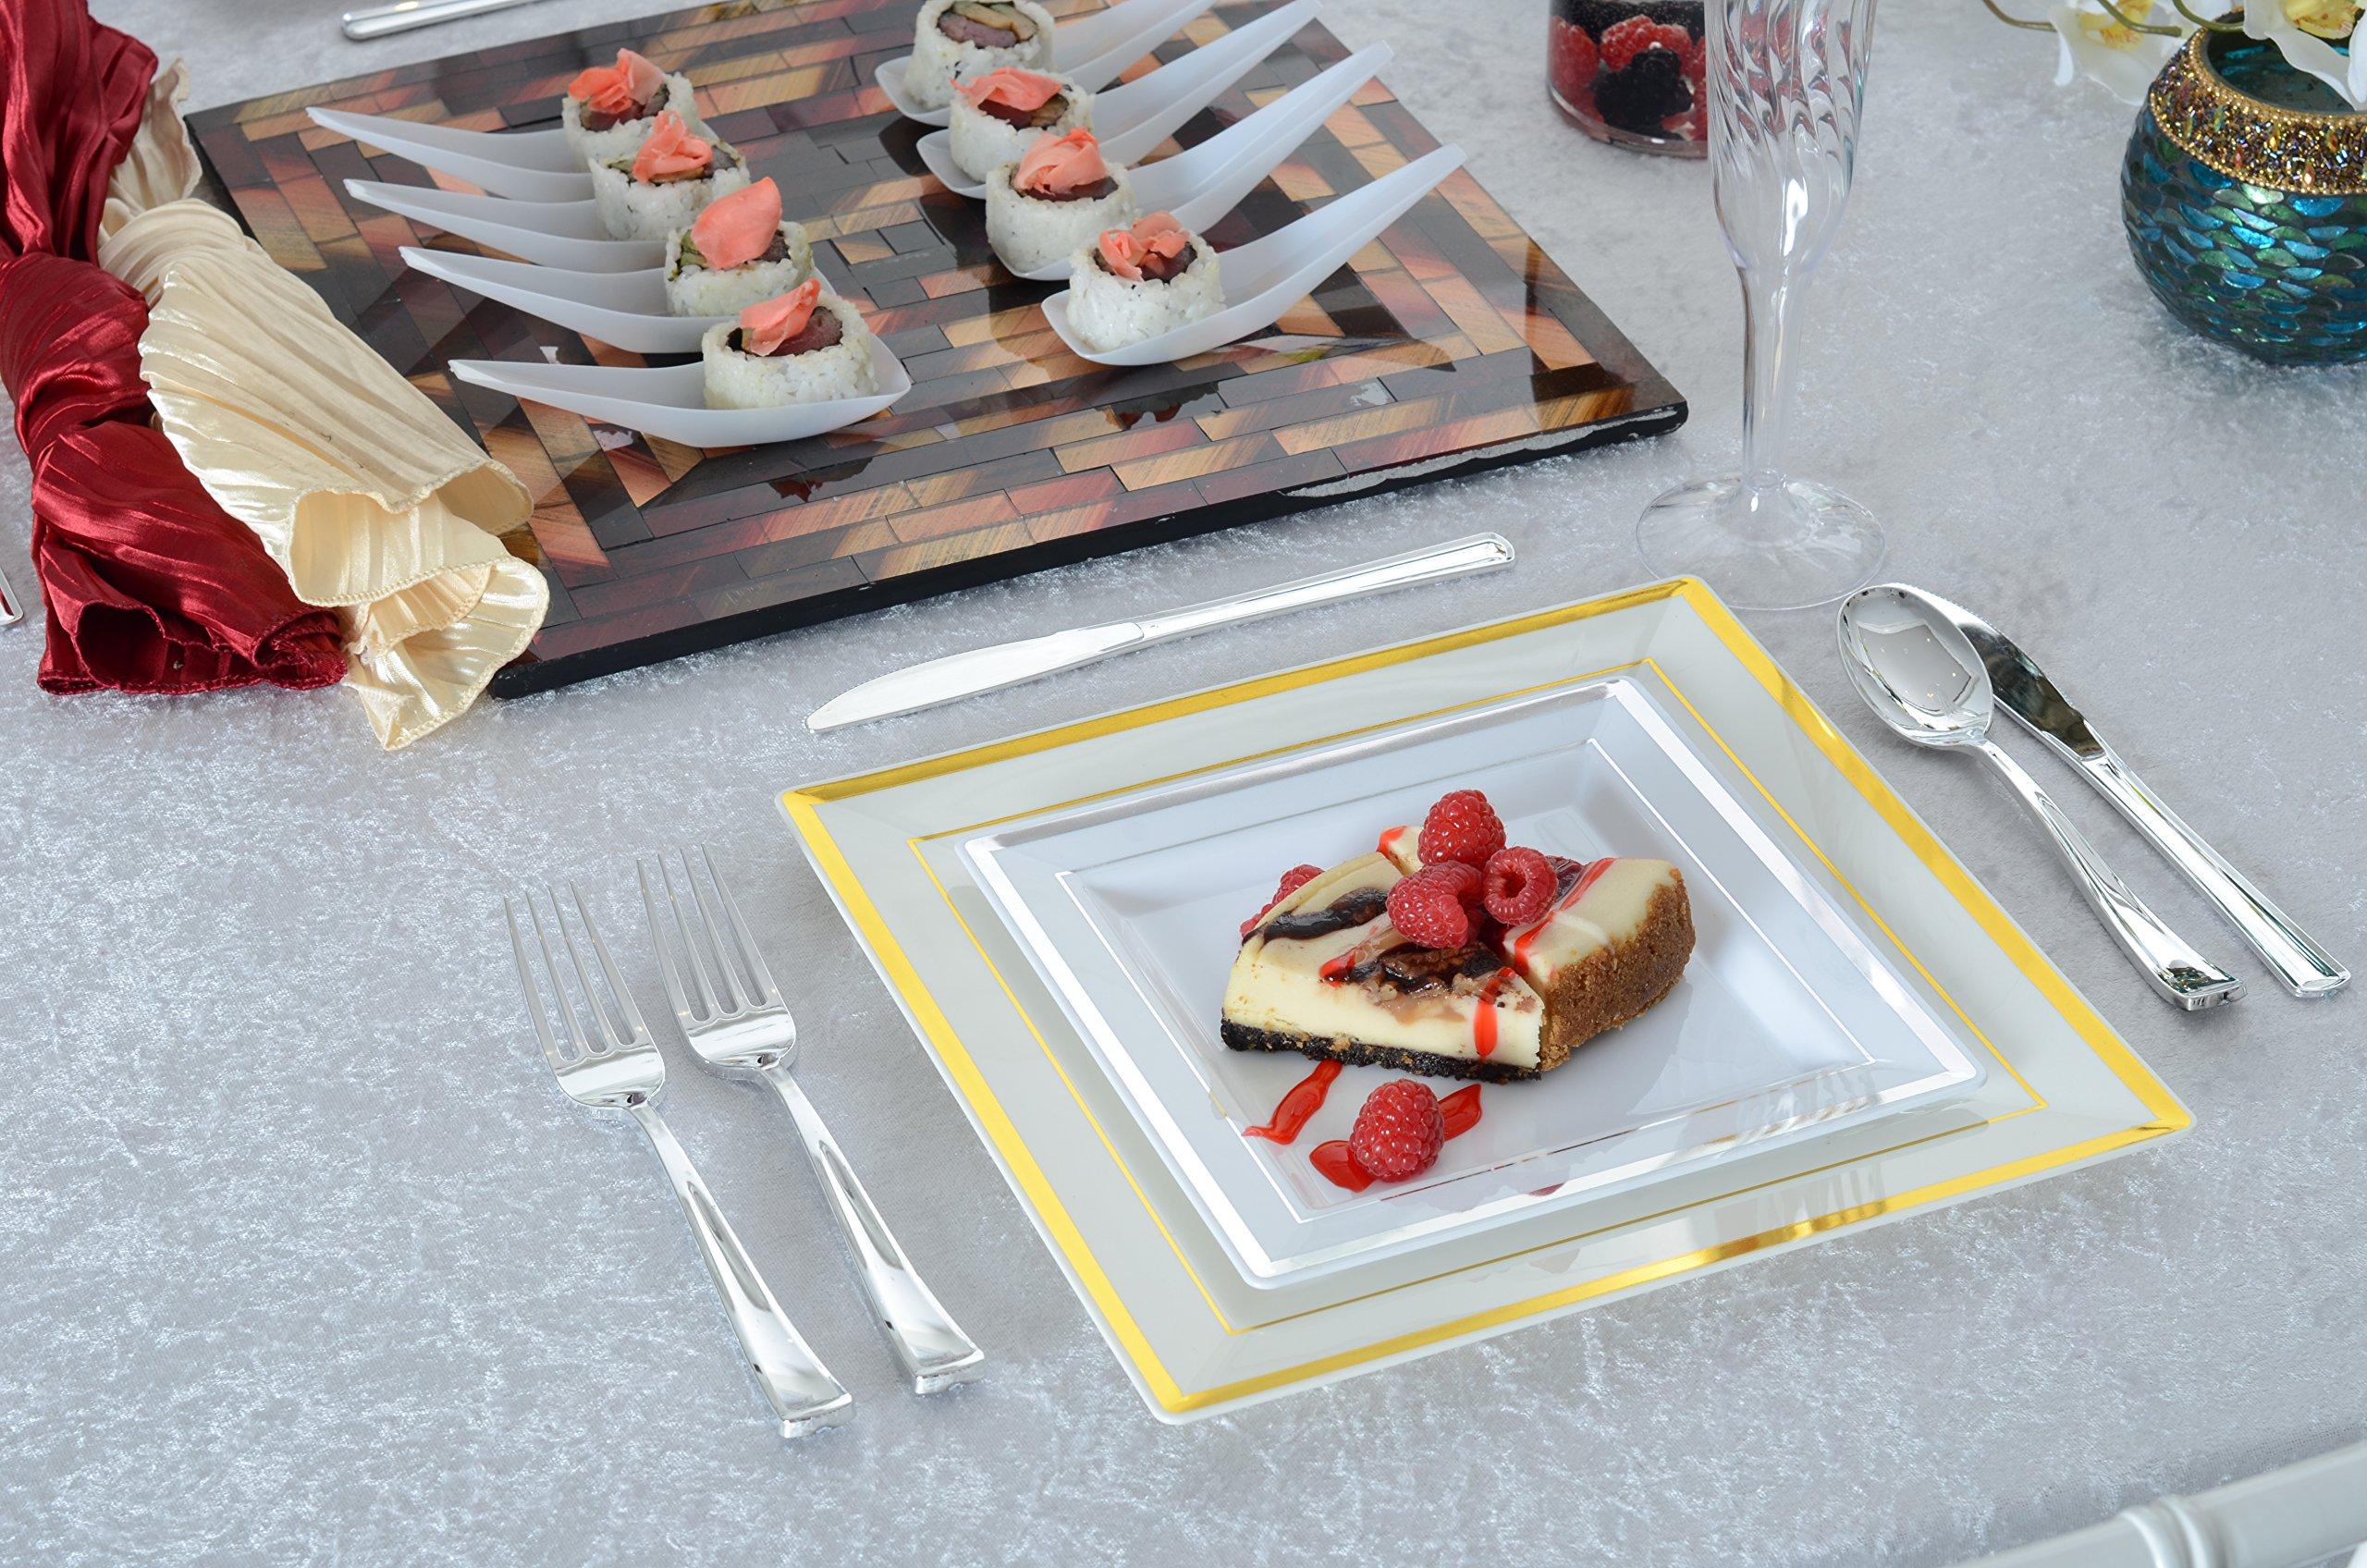 Square Splendor 5507-WH Trim Square Dessert Plate, 7.25-Inch, White and Silver, Pack of 120 by Square Splendor (Image #4)